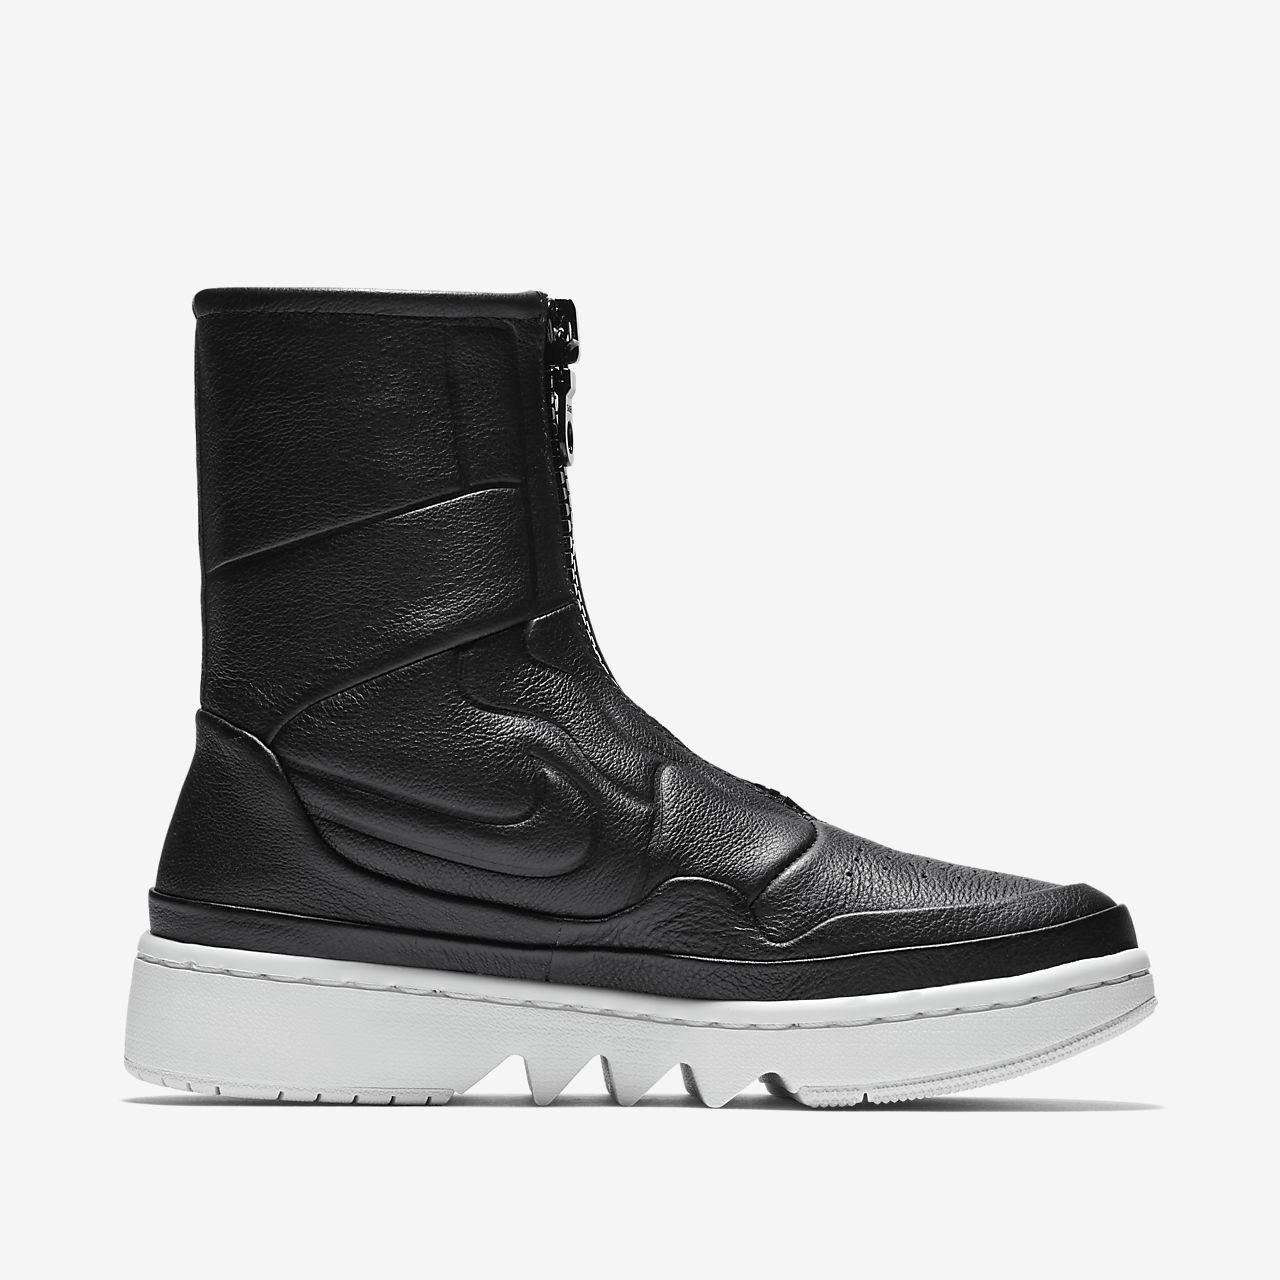 super popular 37e50 bdf6b ... Air Jordan 1 Jester XX Women s Shoe